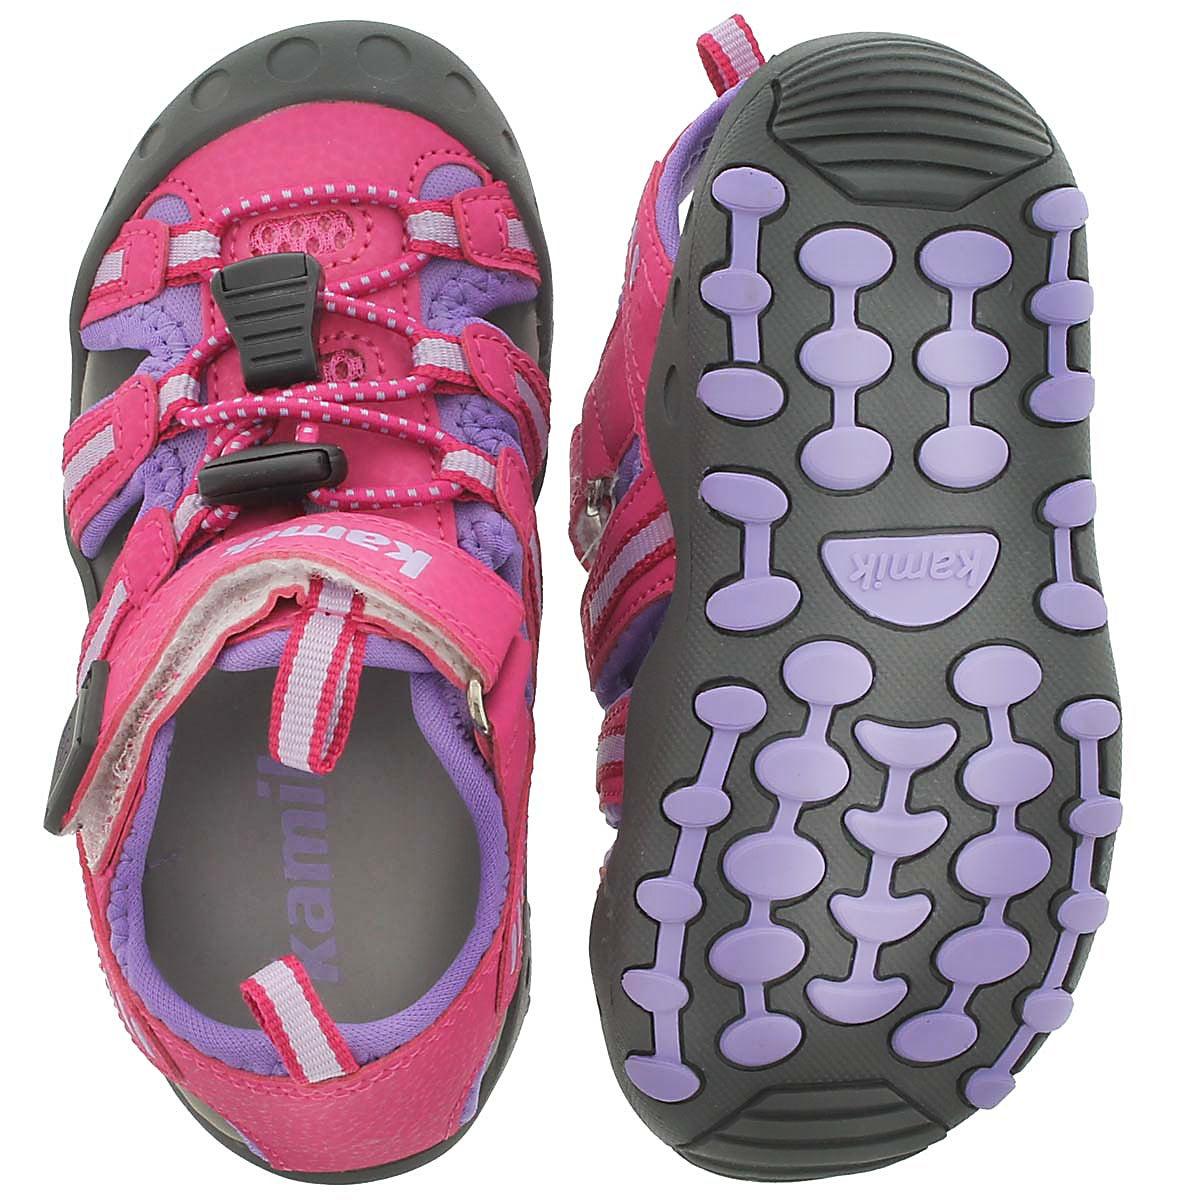 Infs Crab fuchsia closed toe sandal